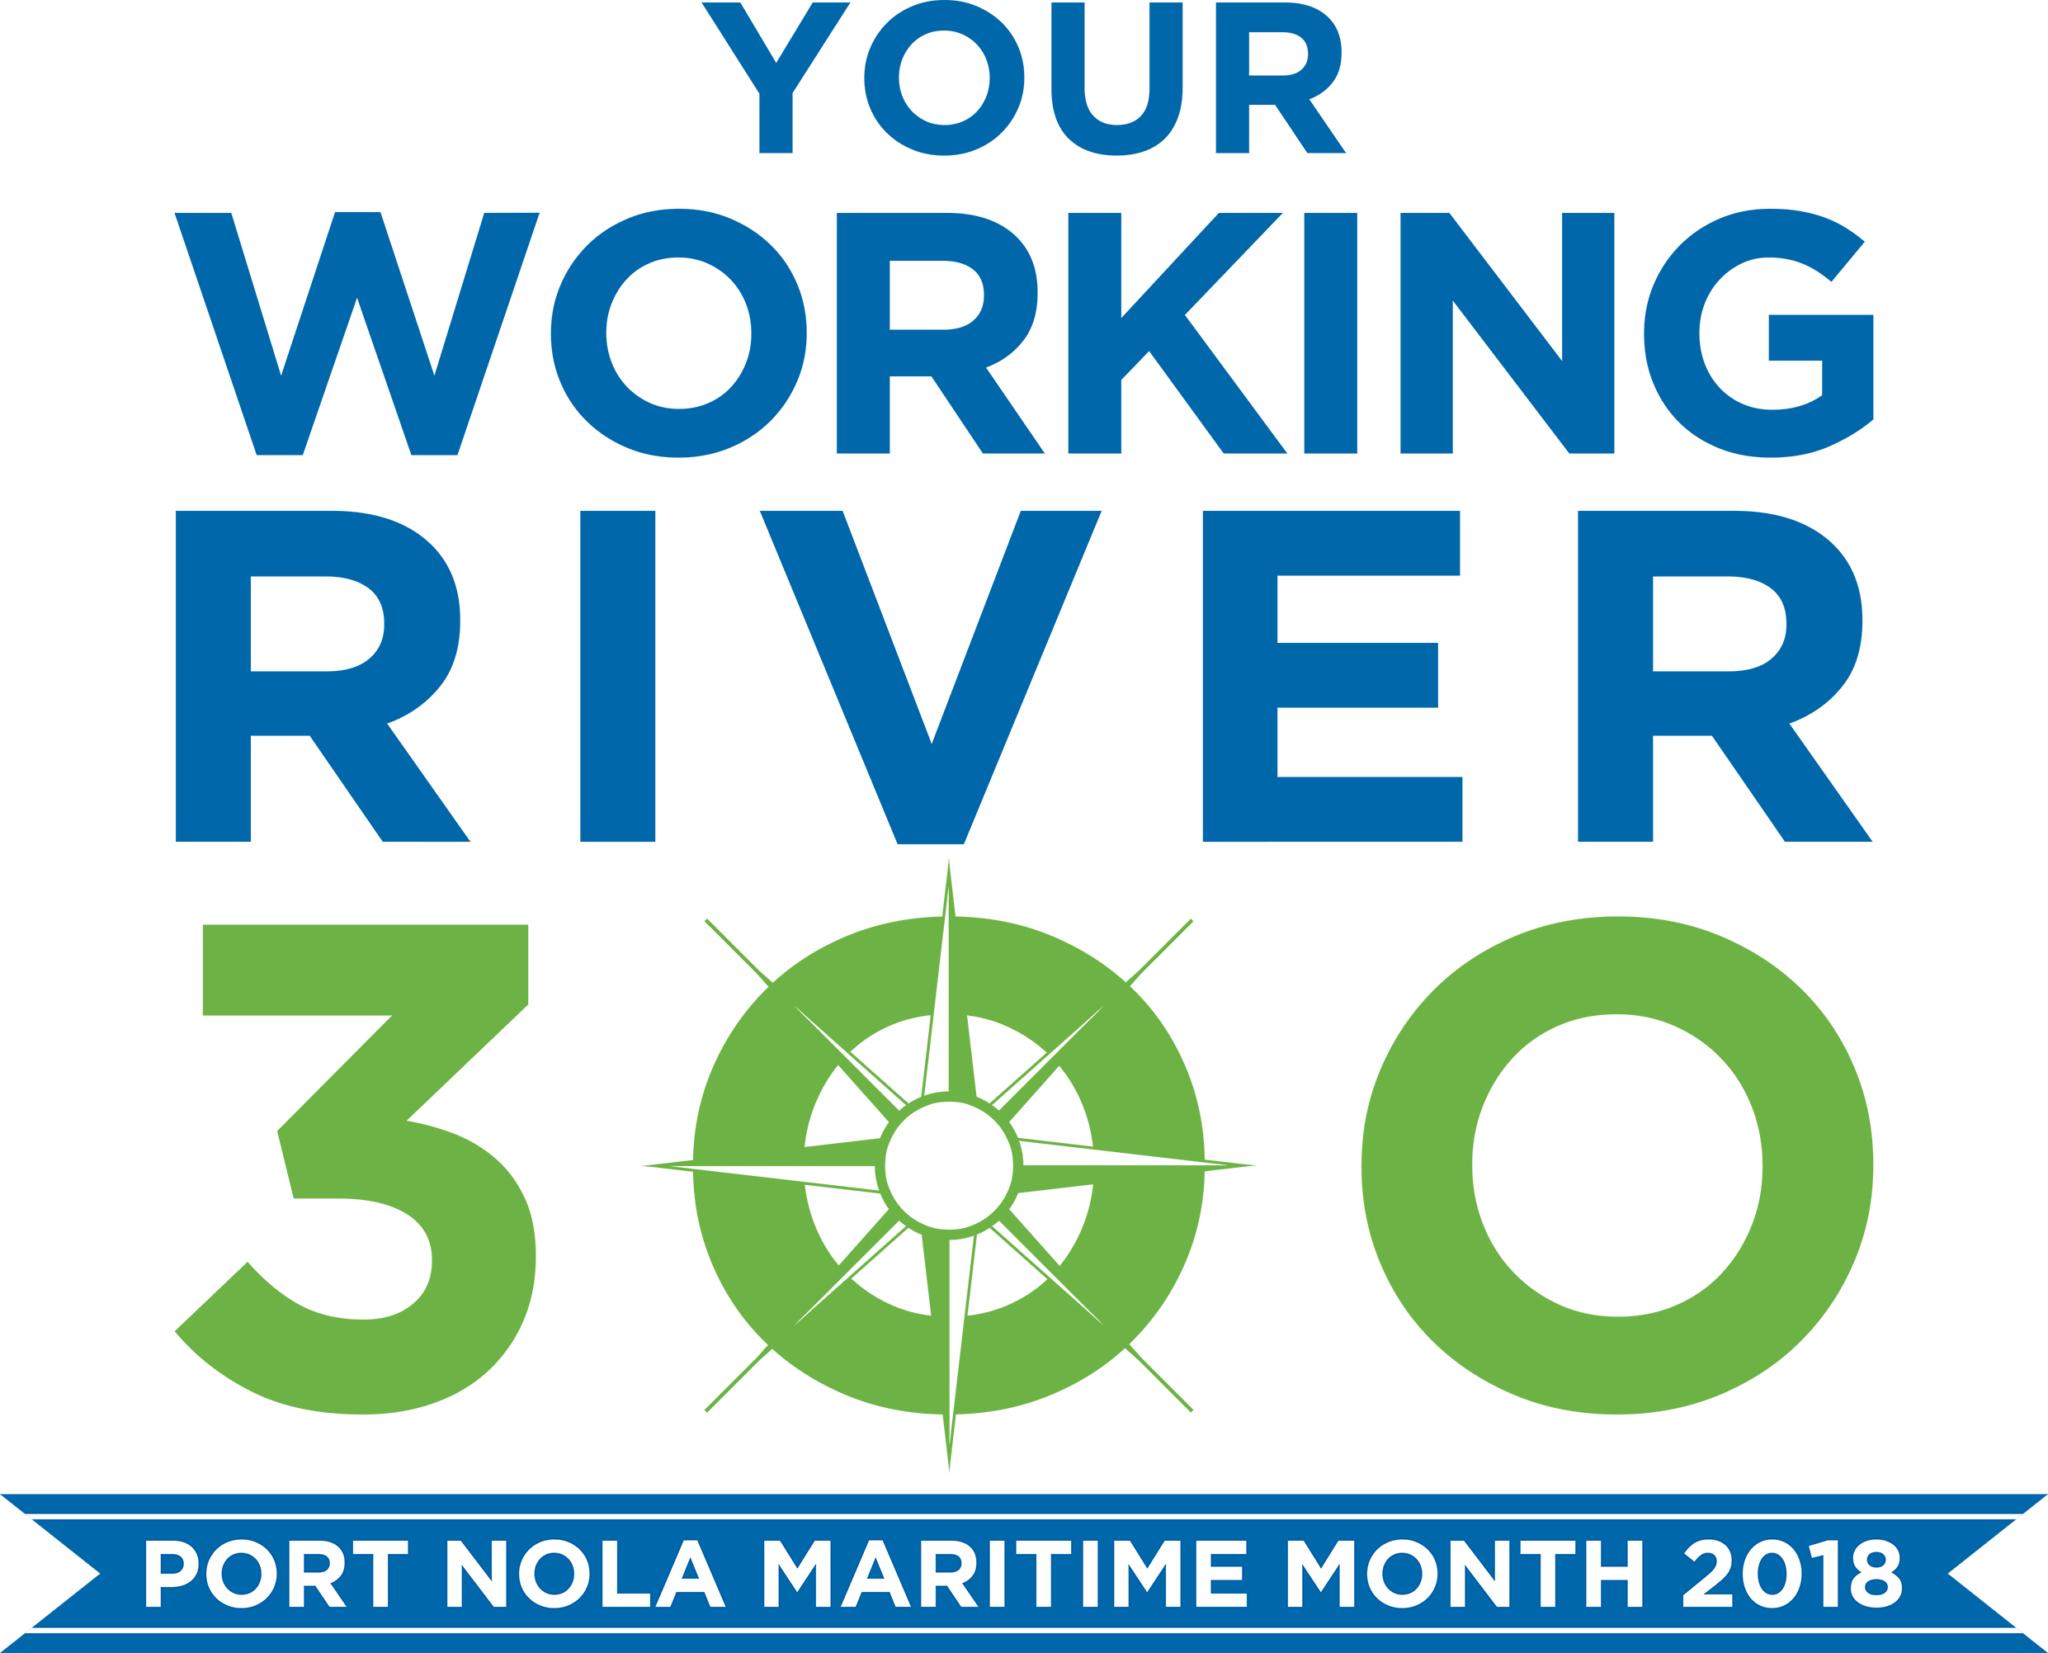 Maritime Month 2018 Logo